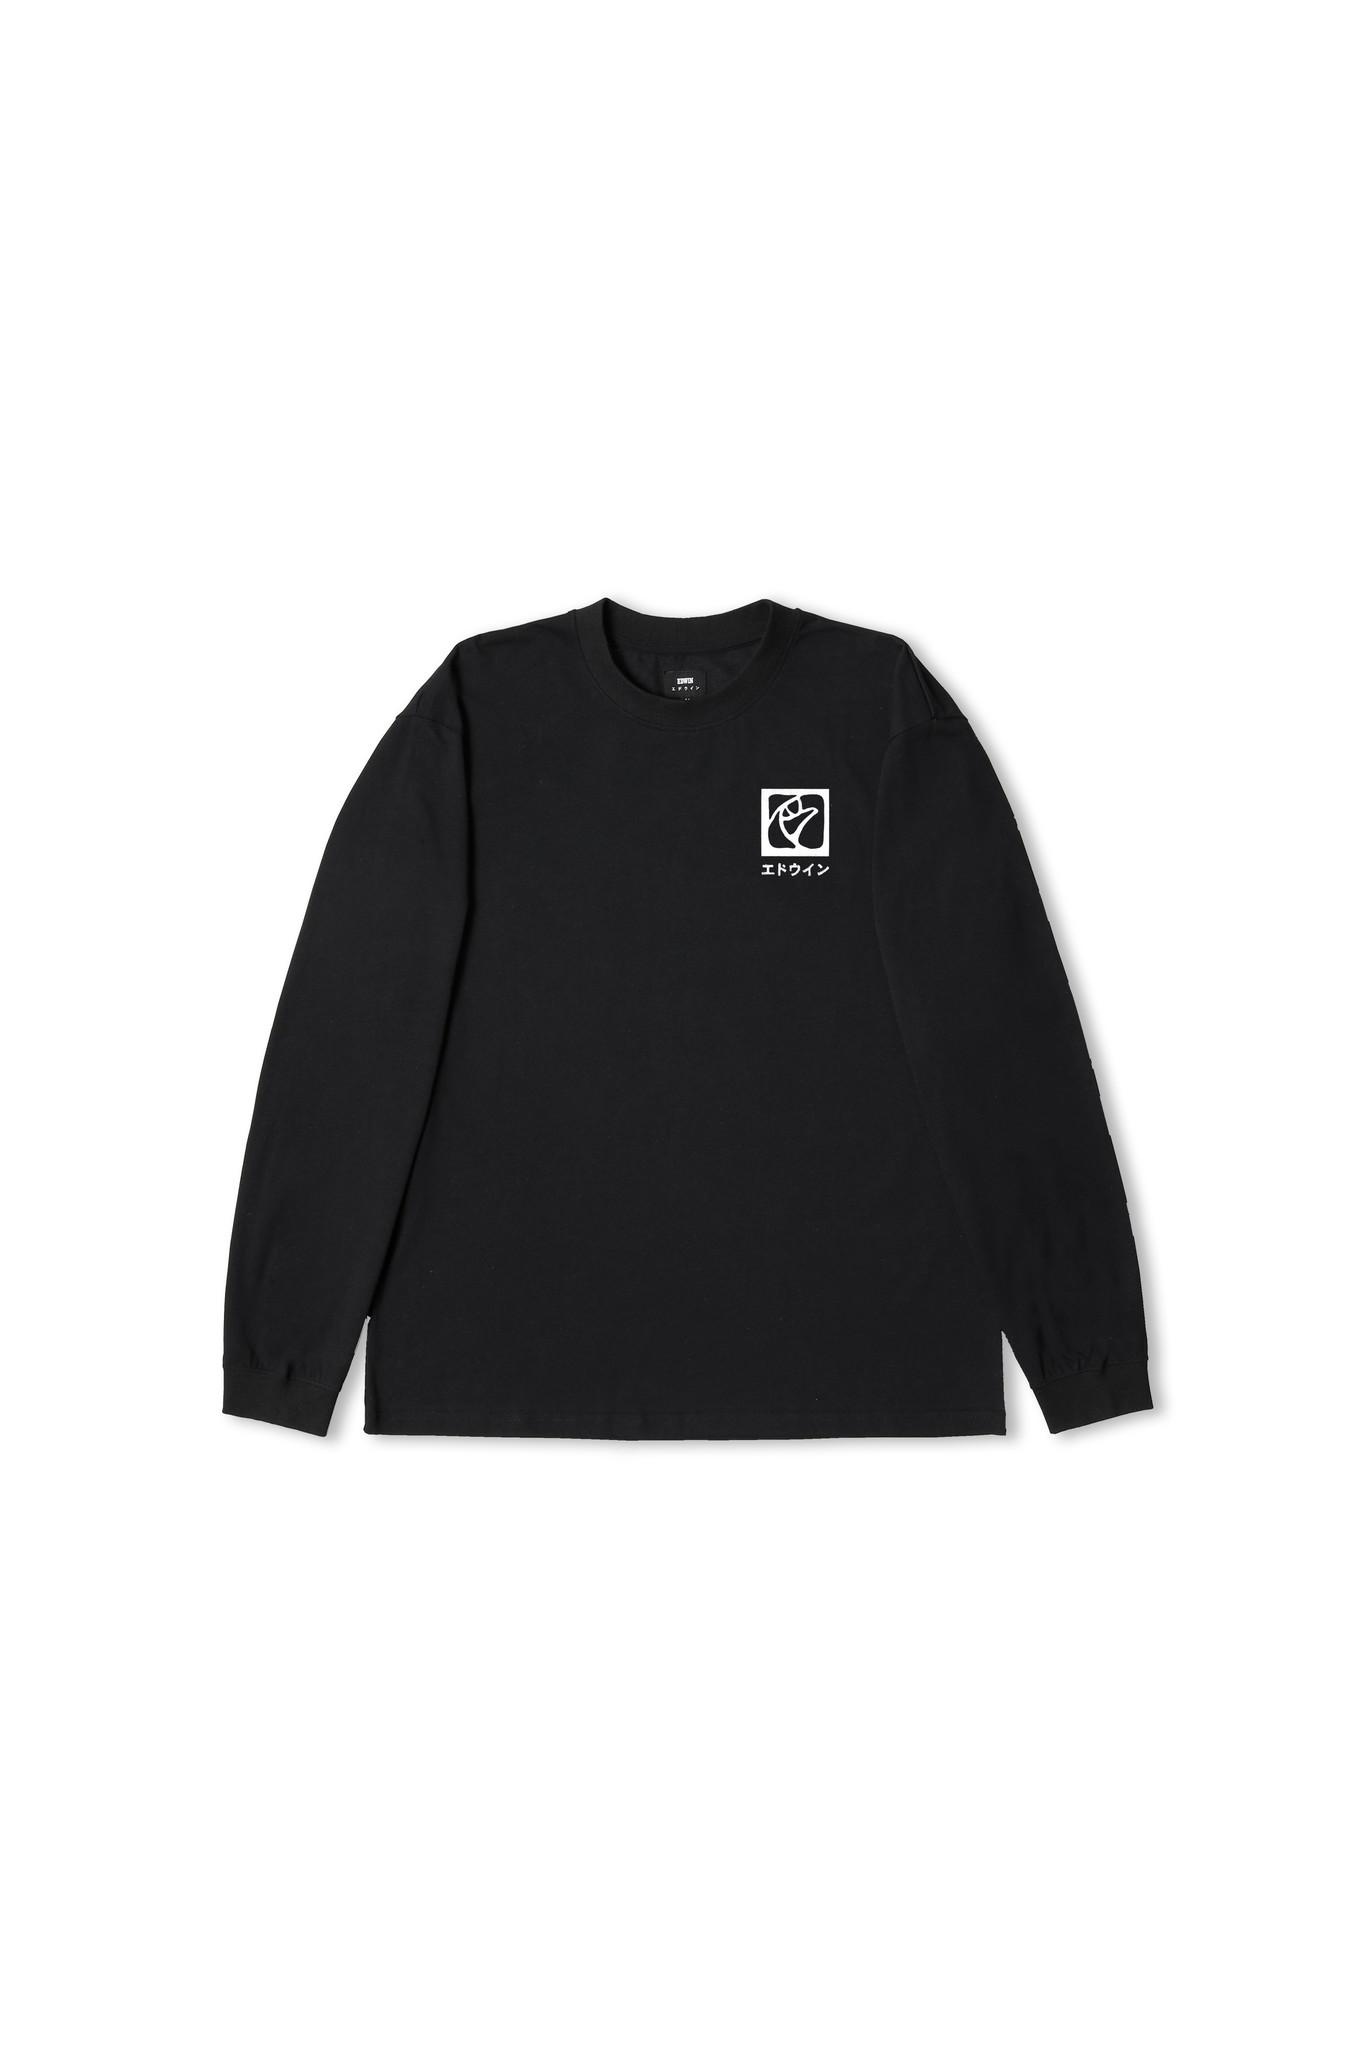 Hanani Longsleeve T-shirt Black-1